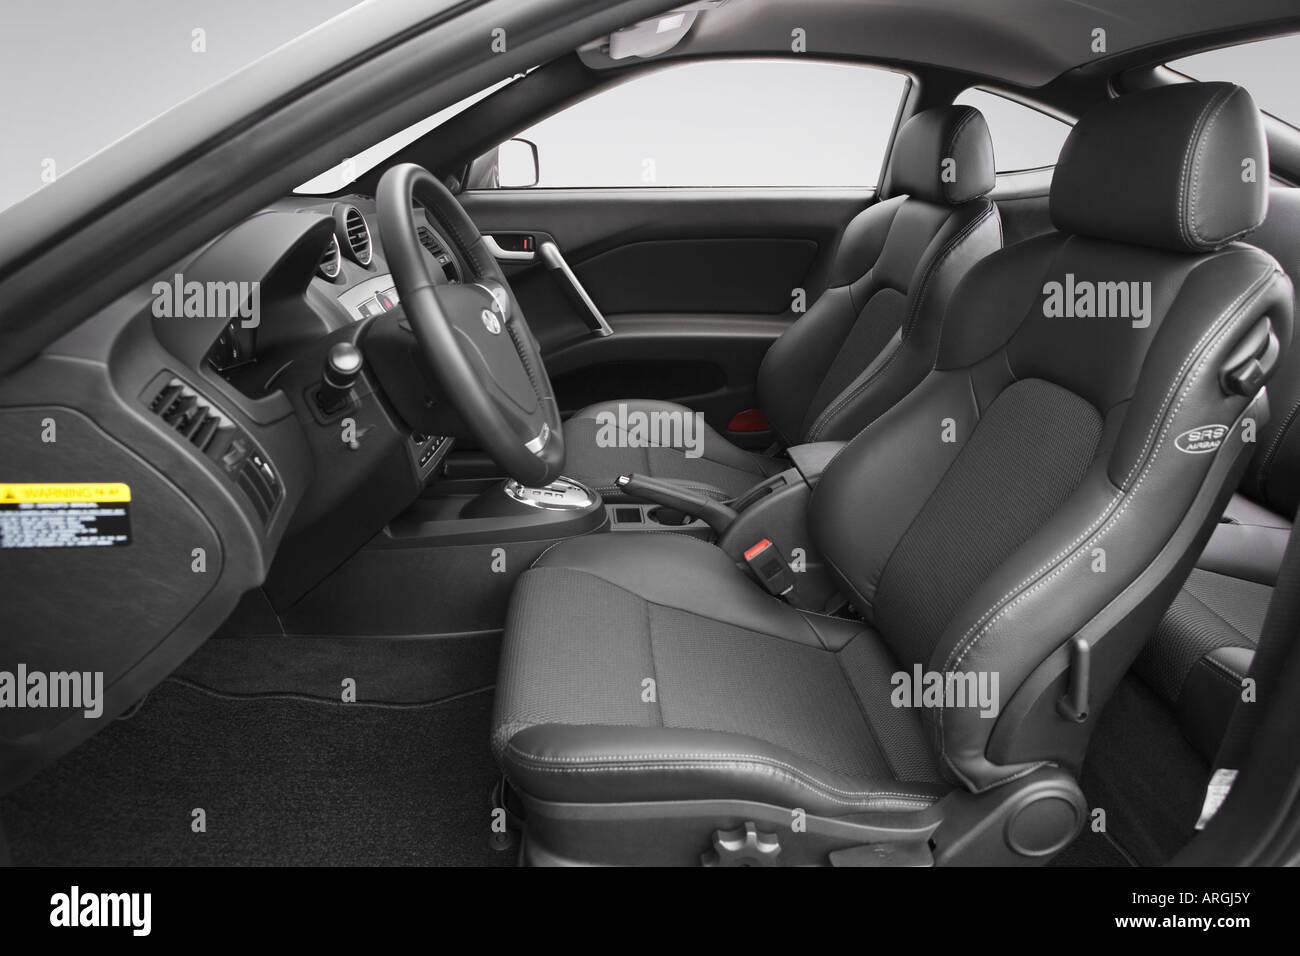 Hyundai Tiburon 2012 For Sale